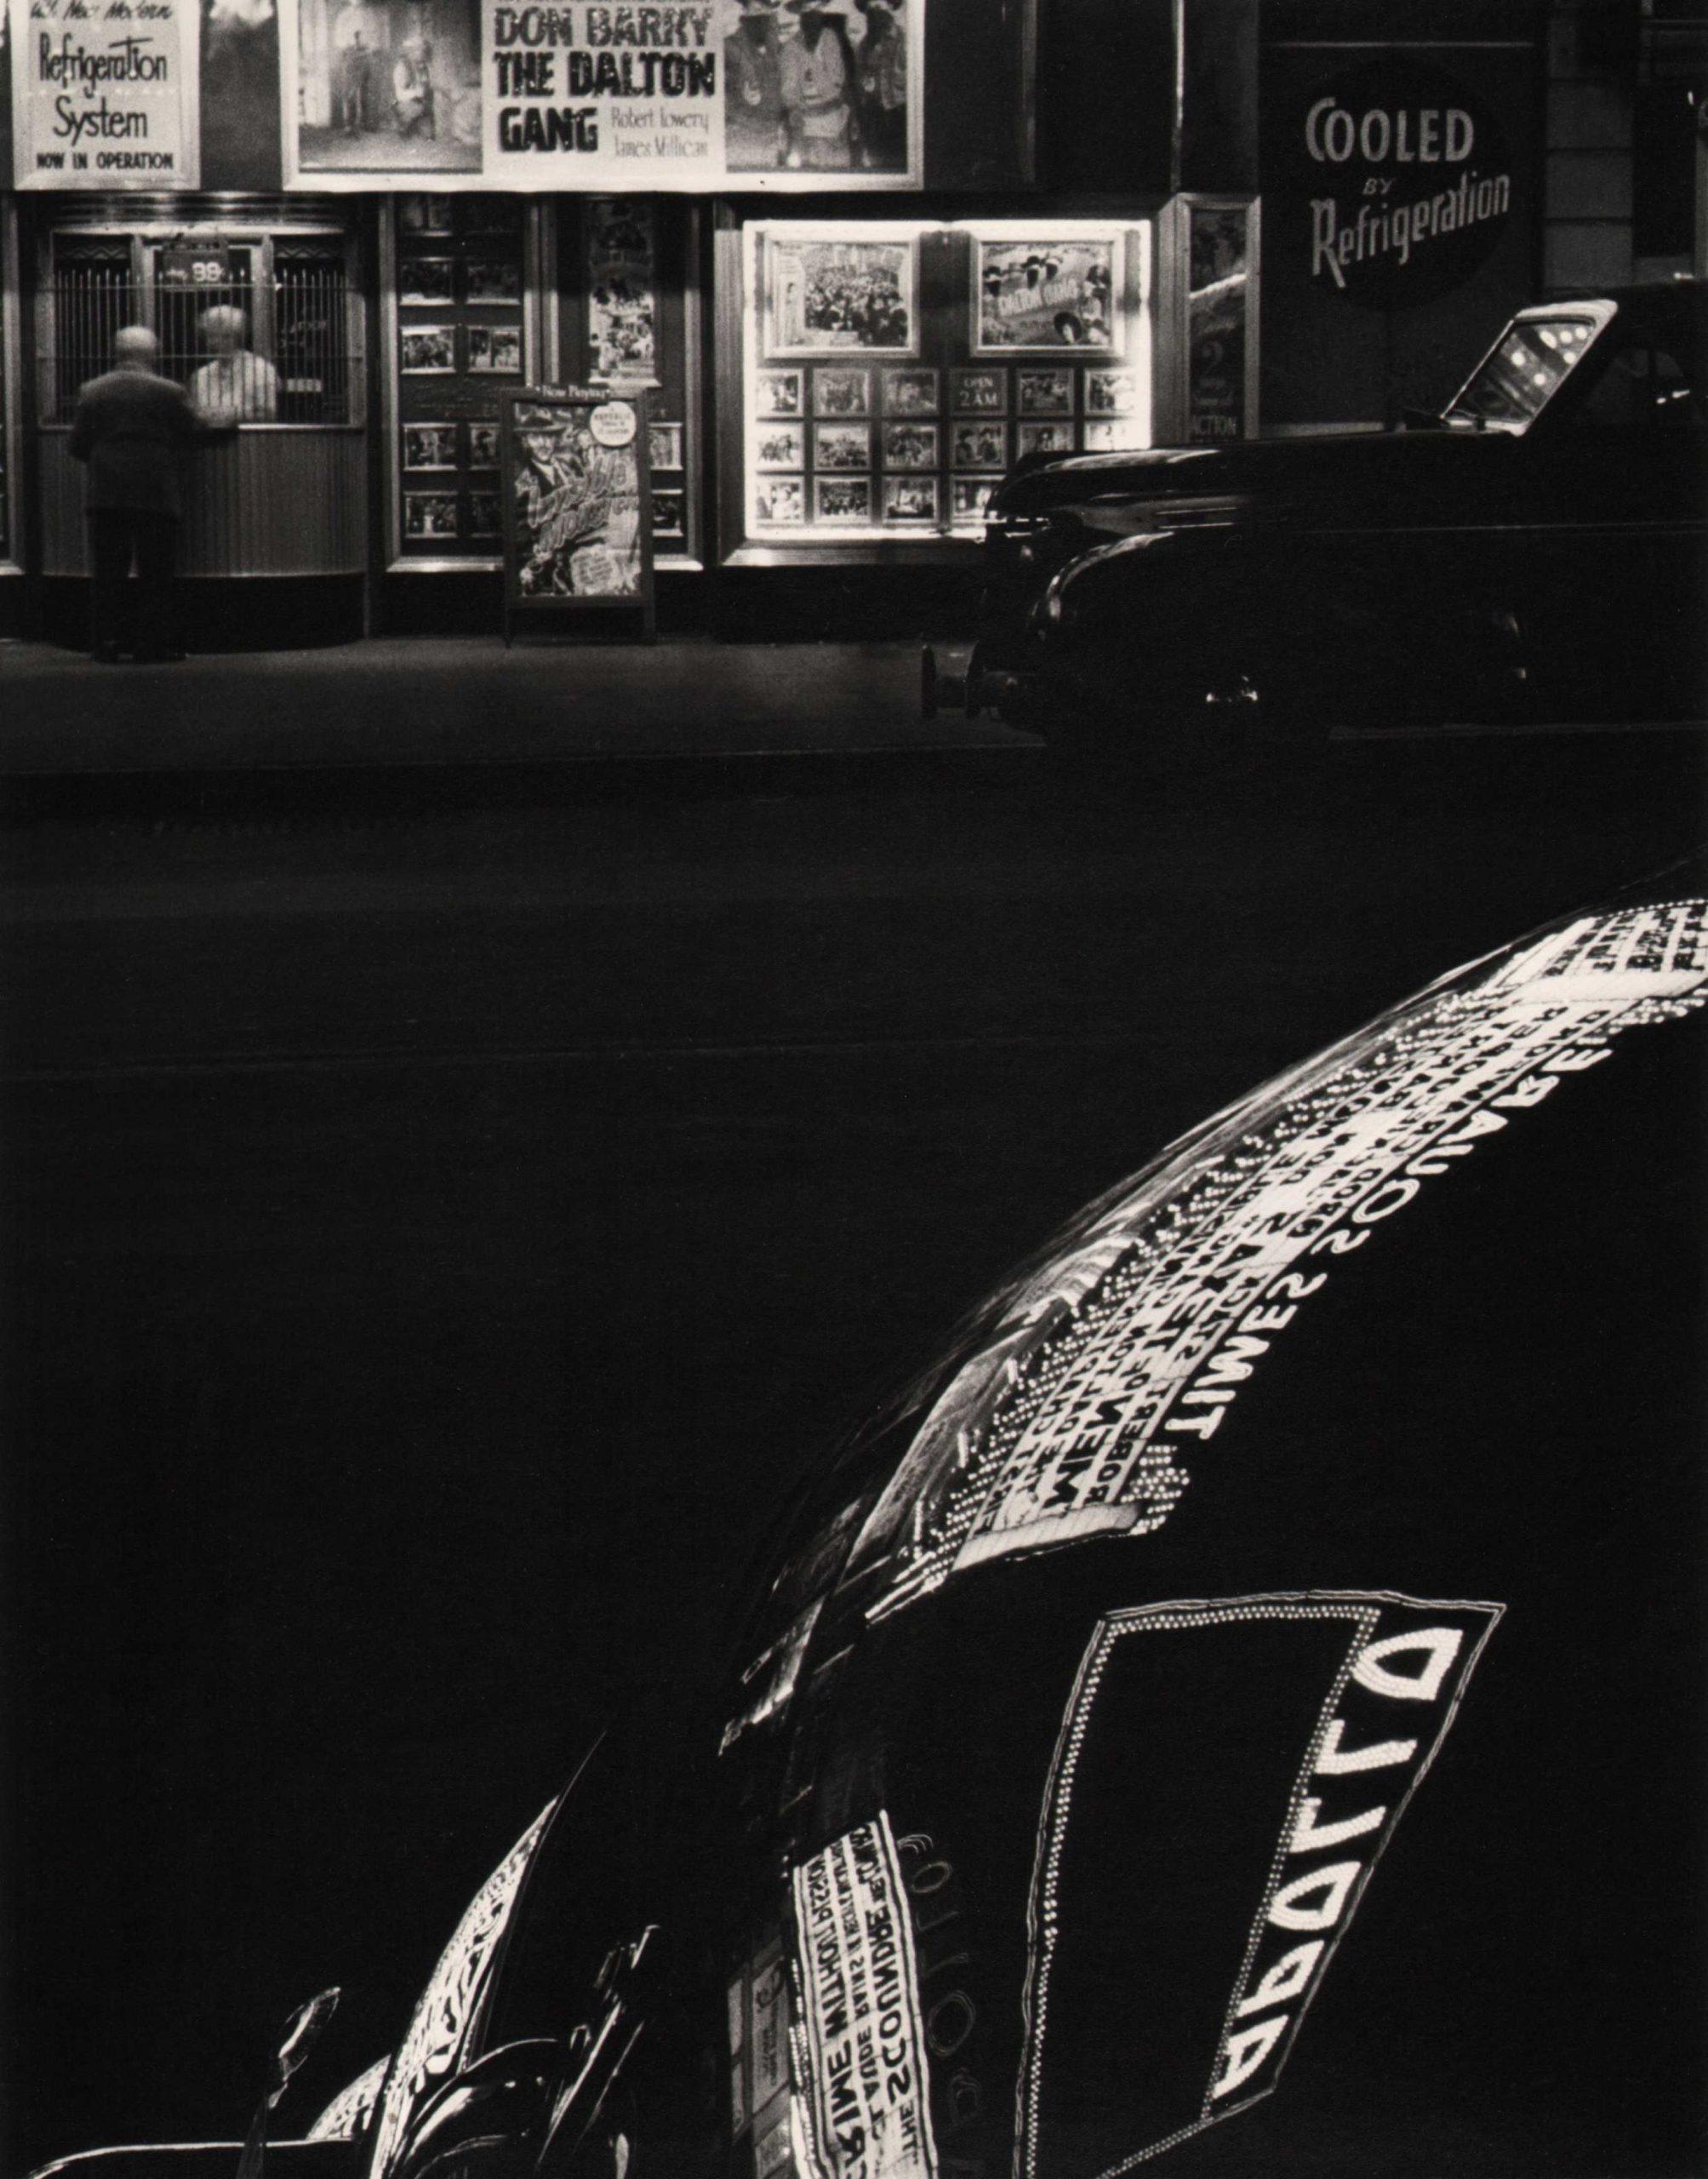 Benn Mitchell, Times Square 42nd Street, New York City, c. 1955